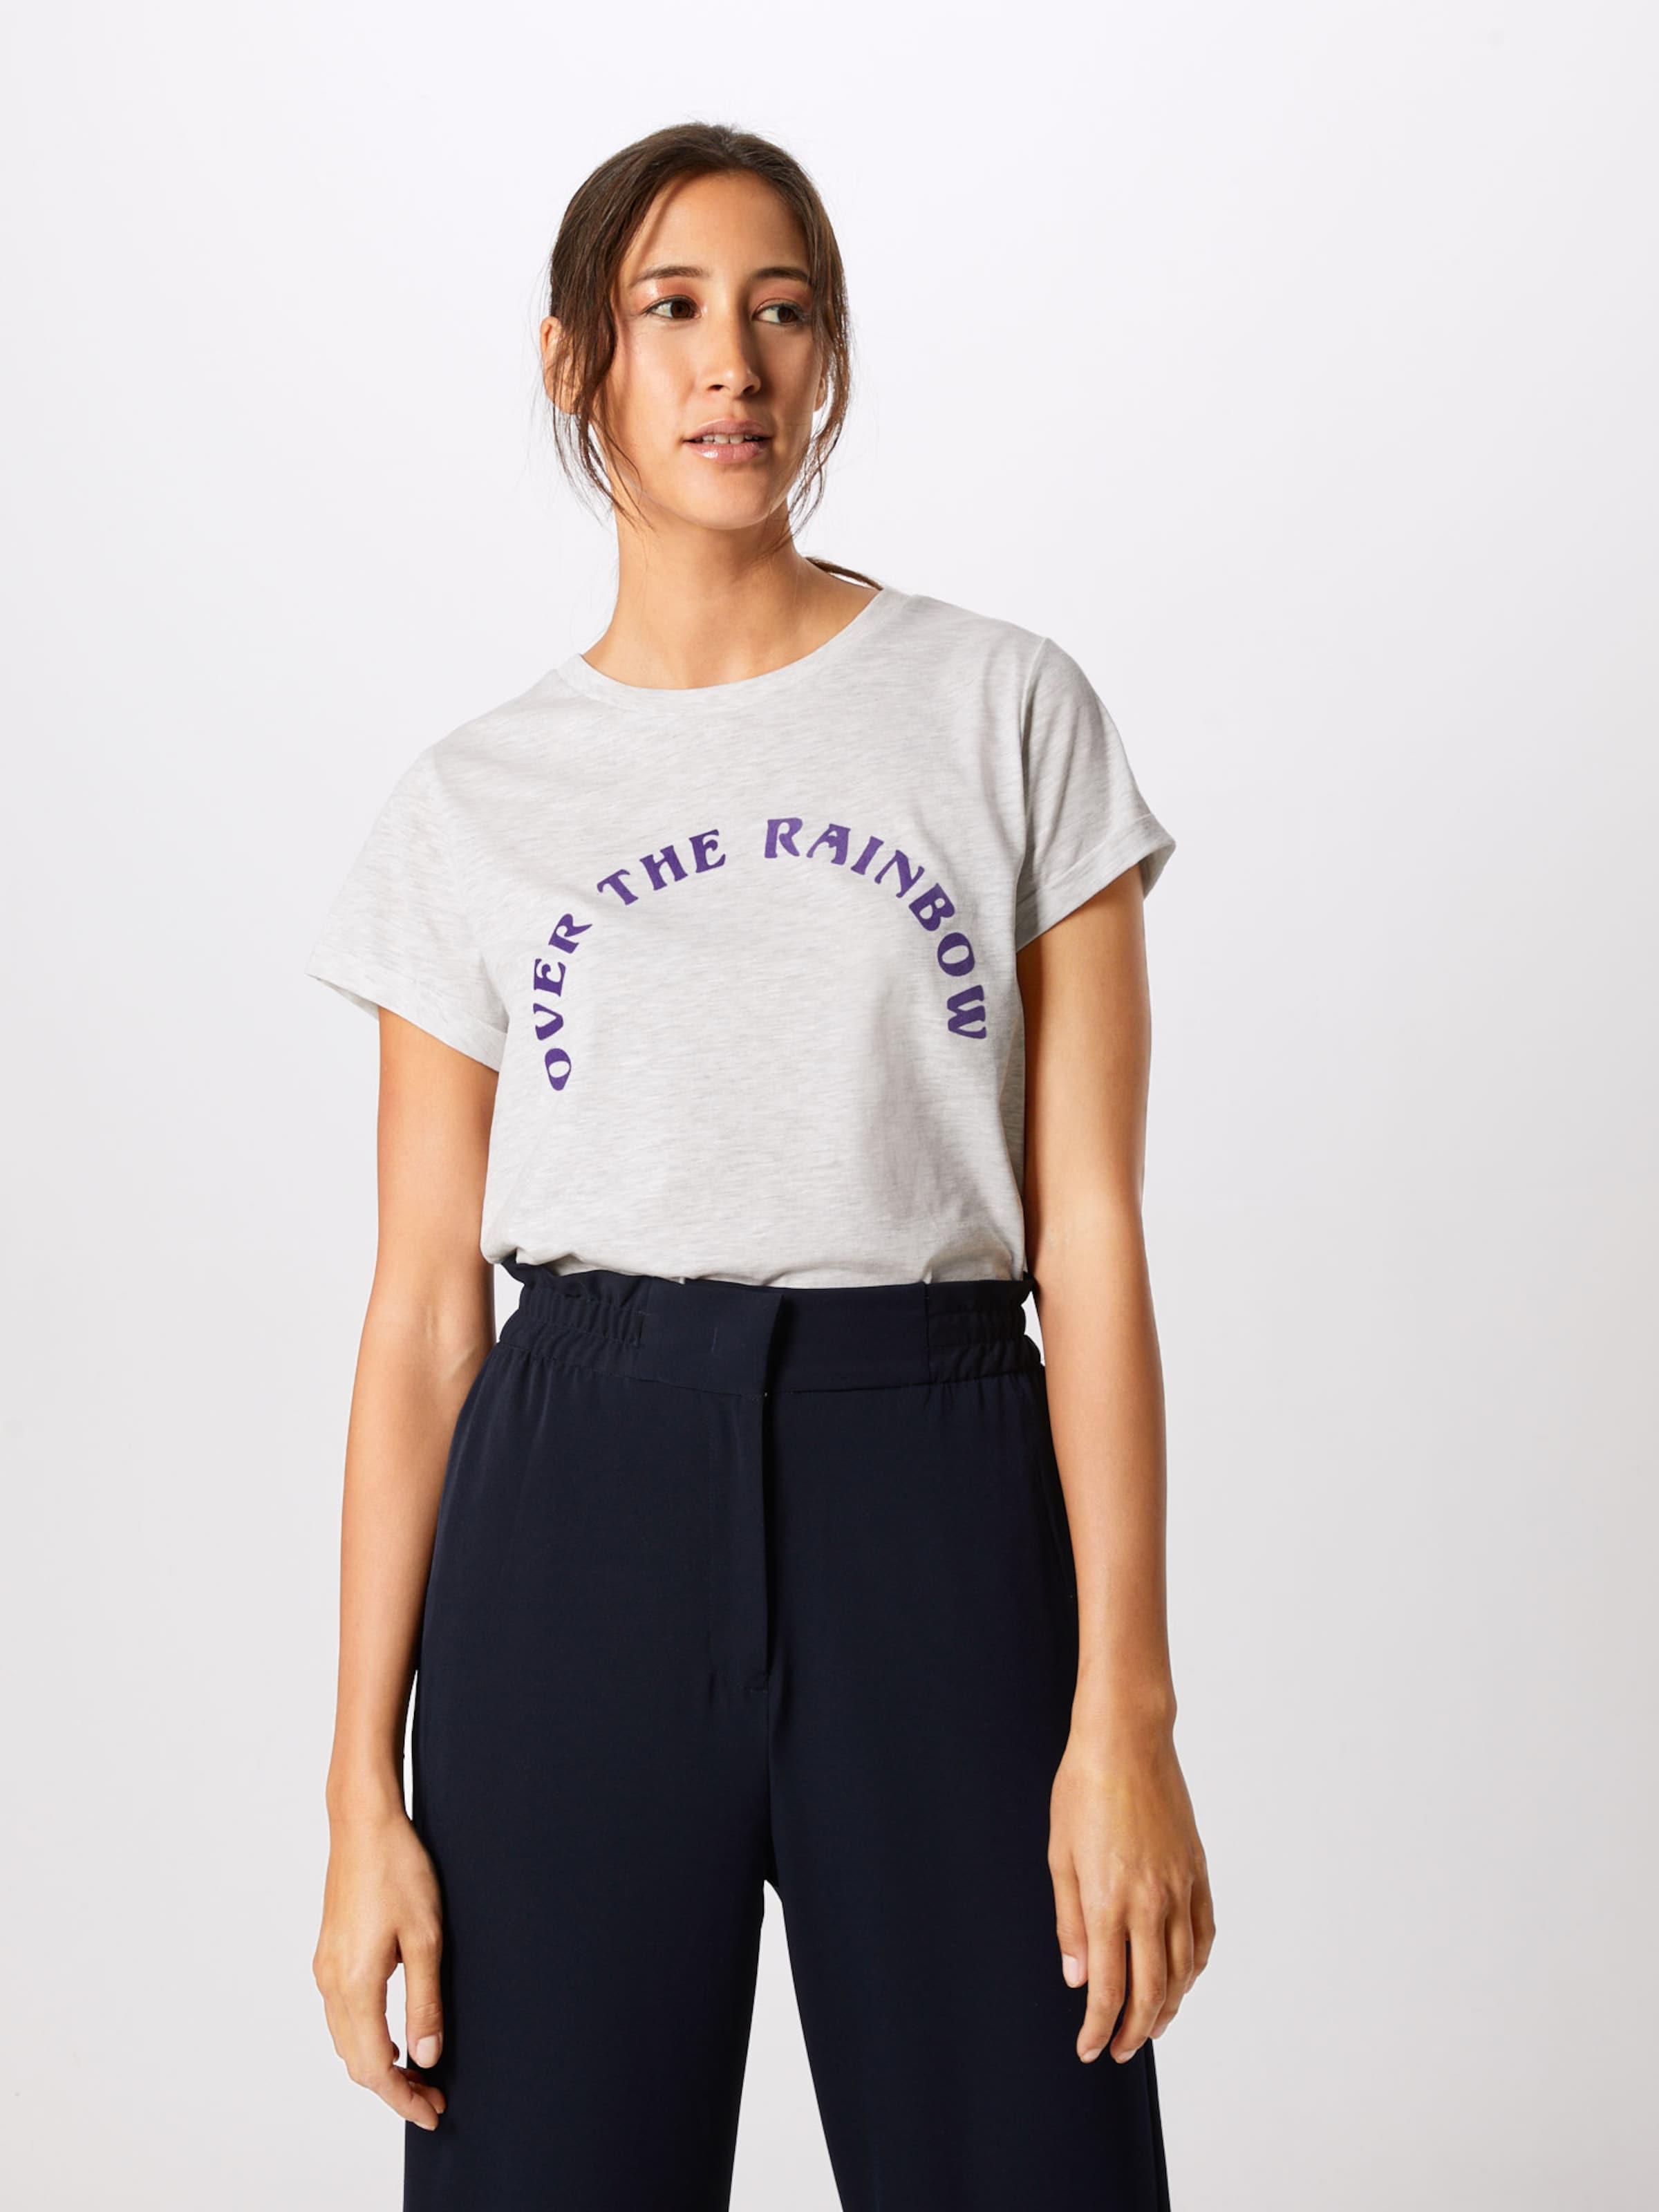 shirt Catwalk T 'ts ChinéViolet Gris Rainbow' En Junkie FK3Jc1Tlu